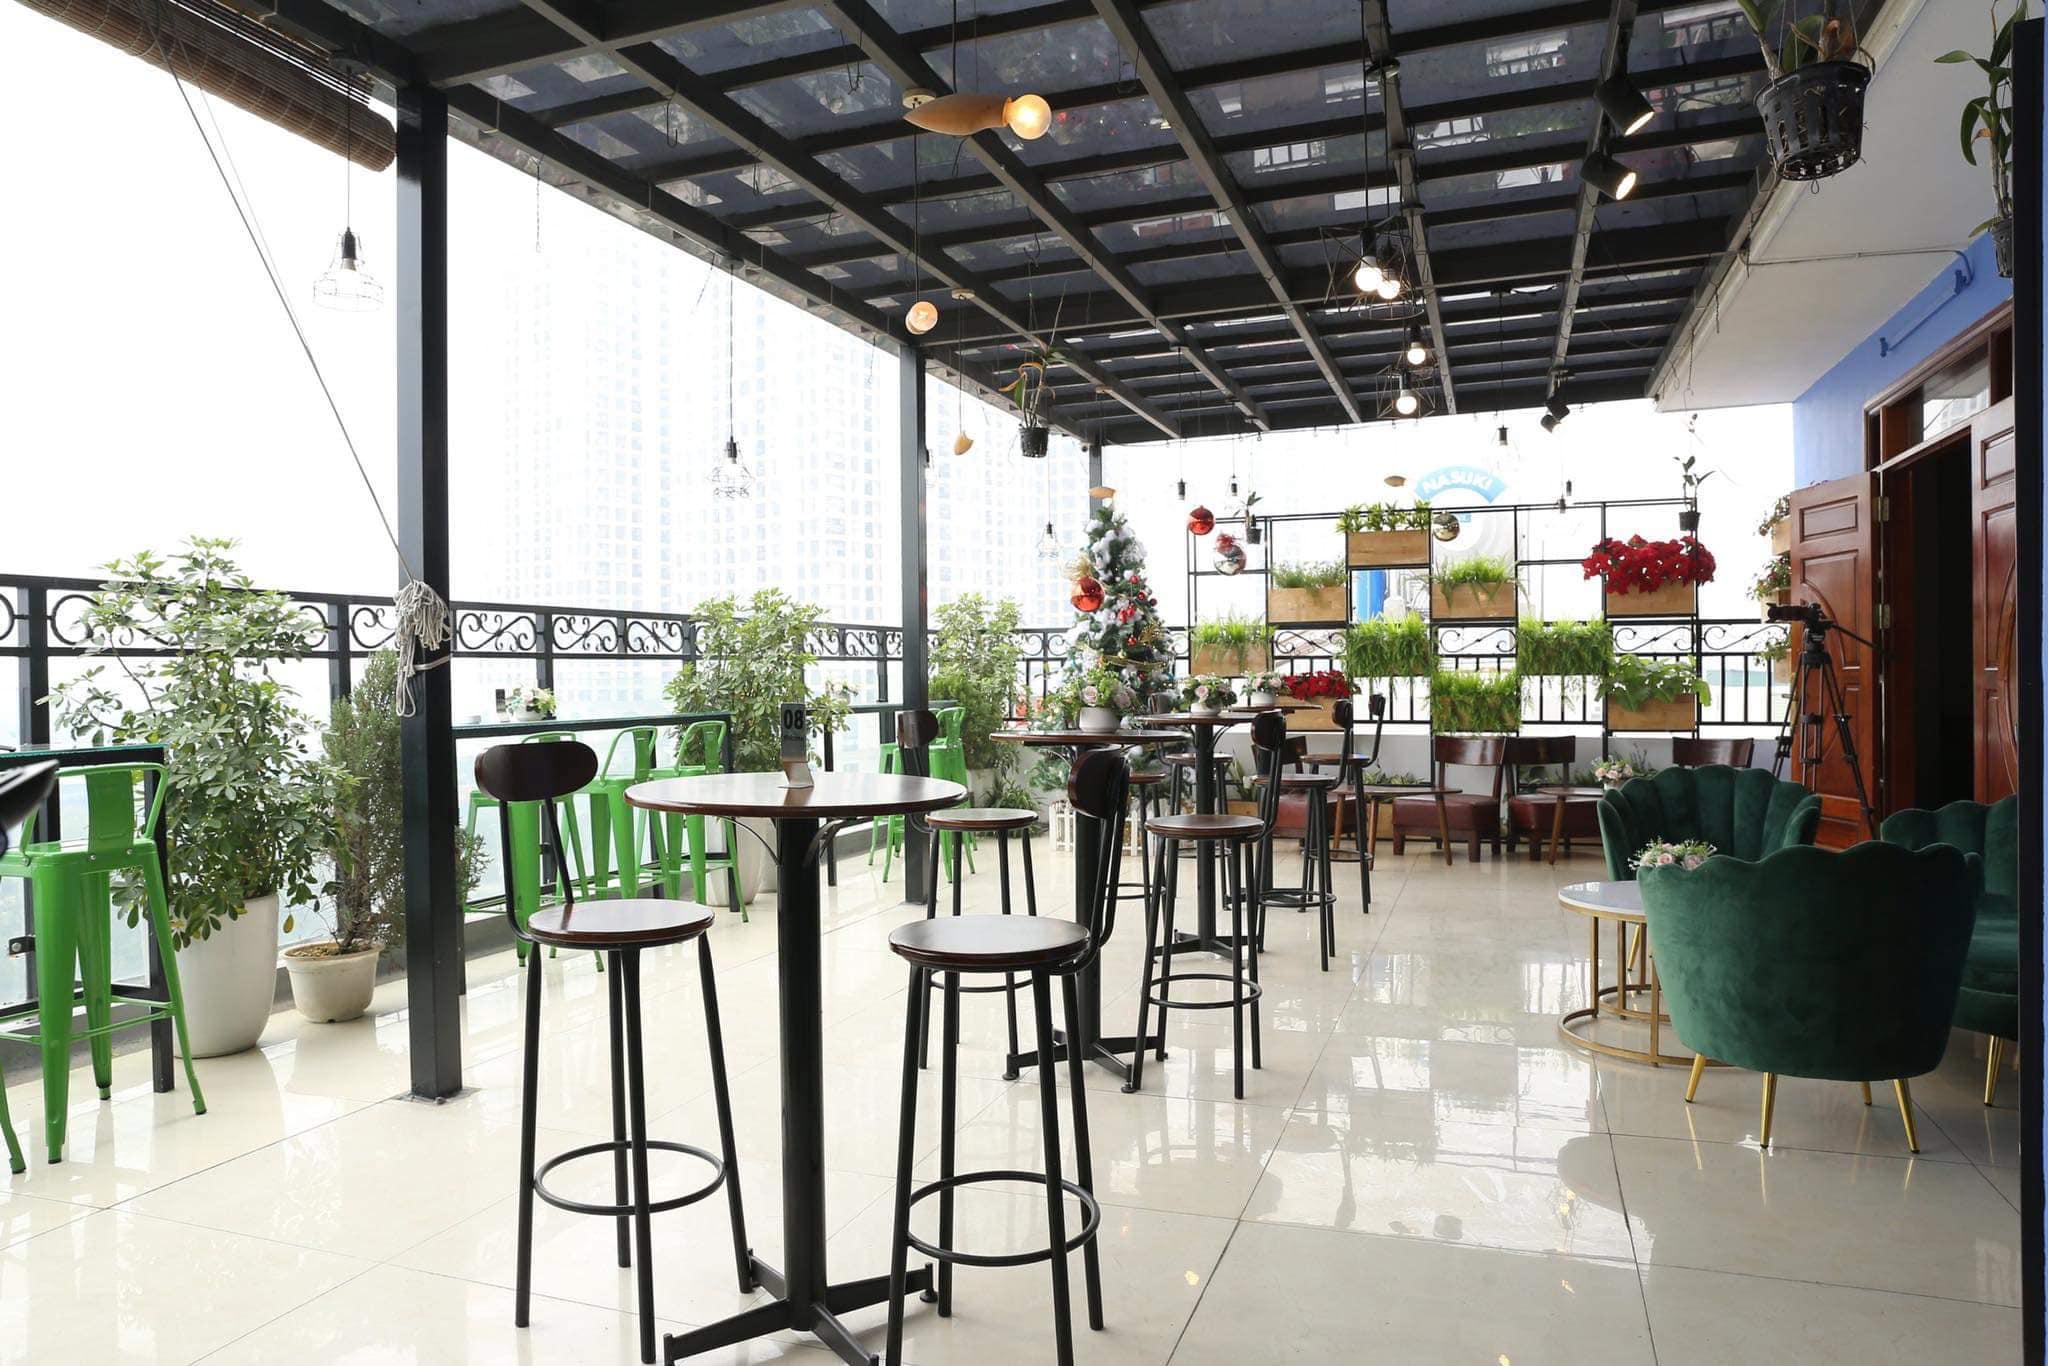 Green View Coffe